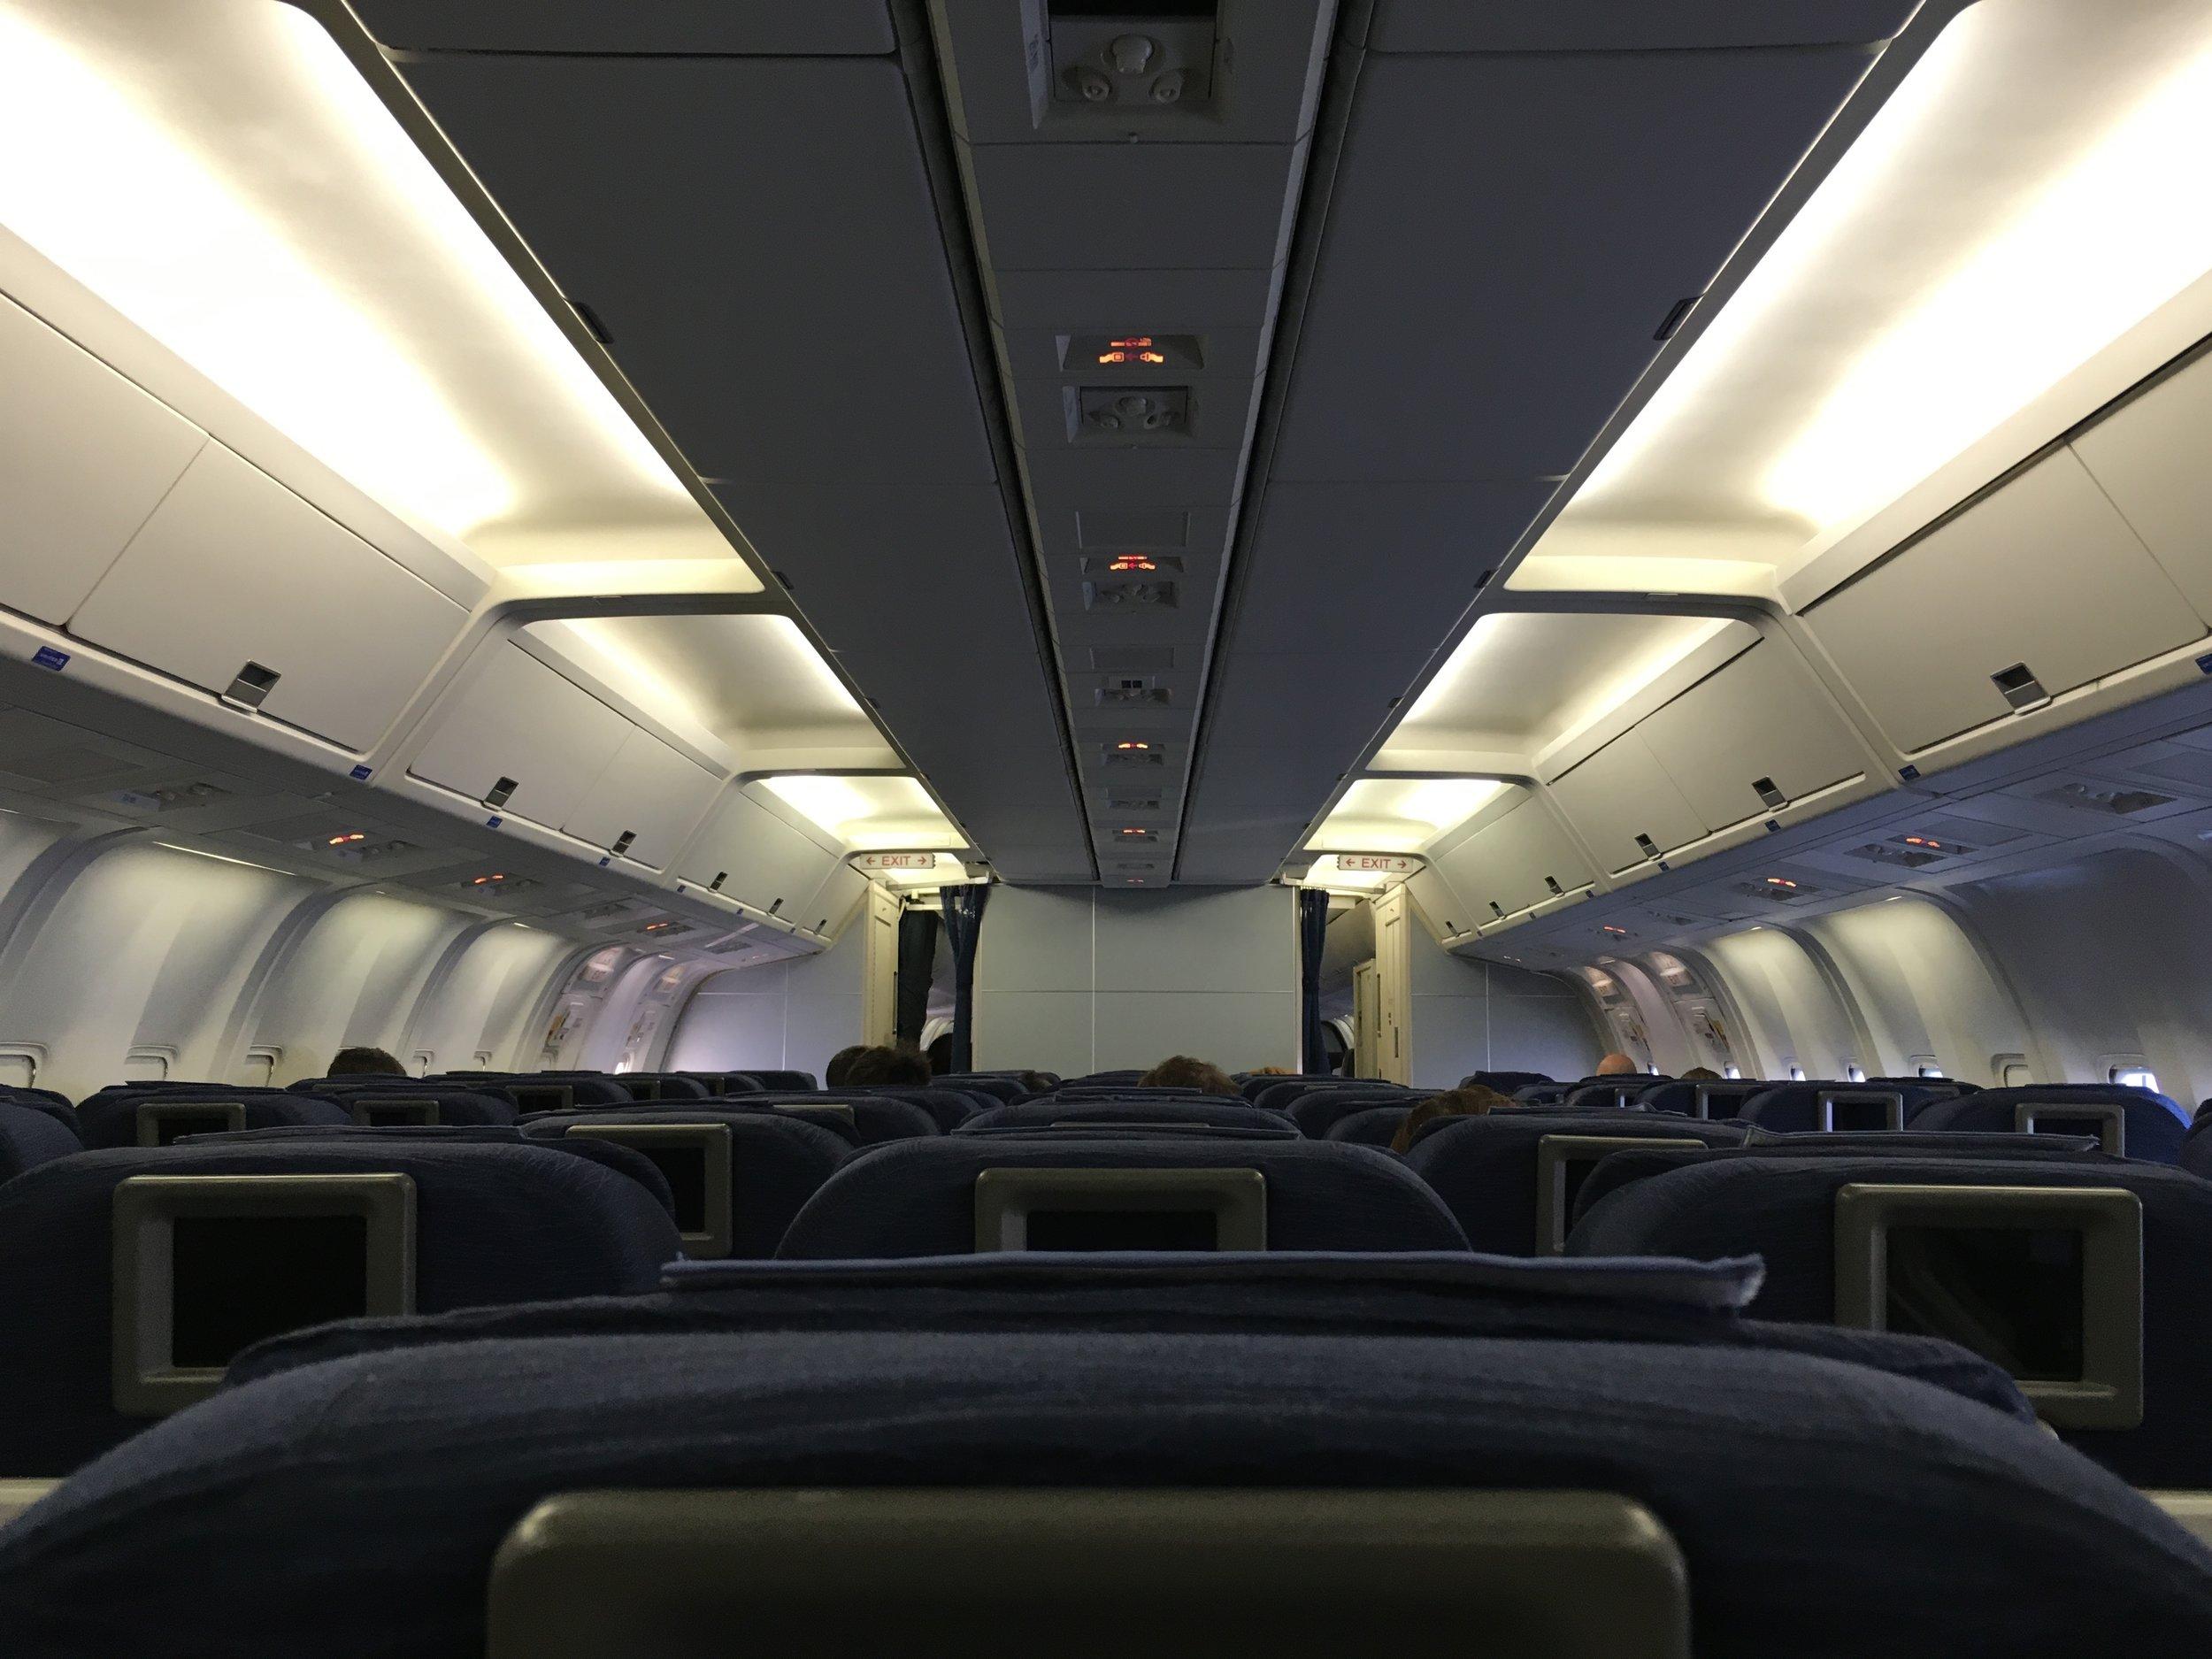 Thank God for long empty flights.